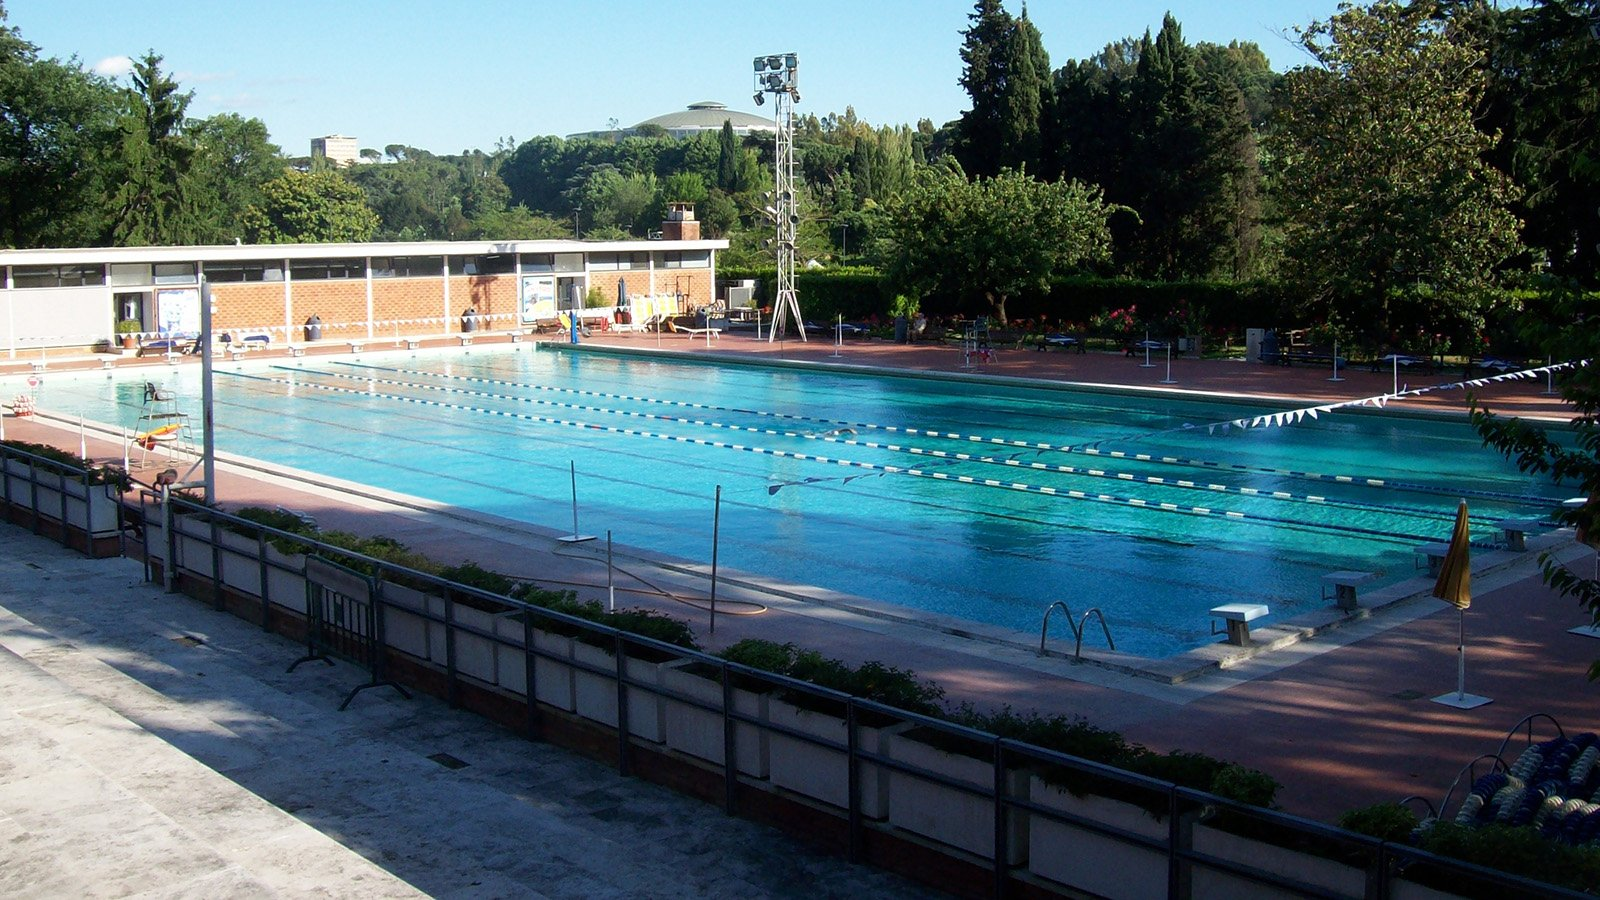 The Club Piscina delle Rose